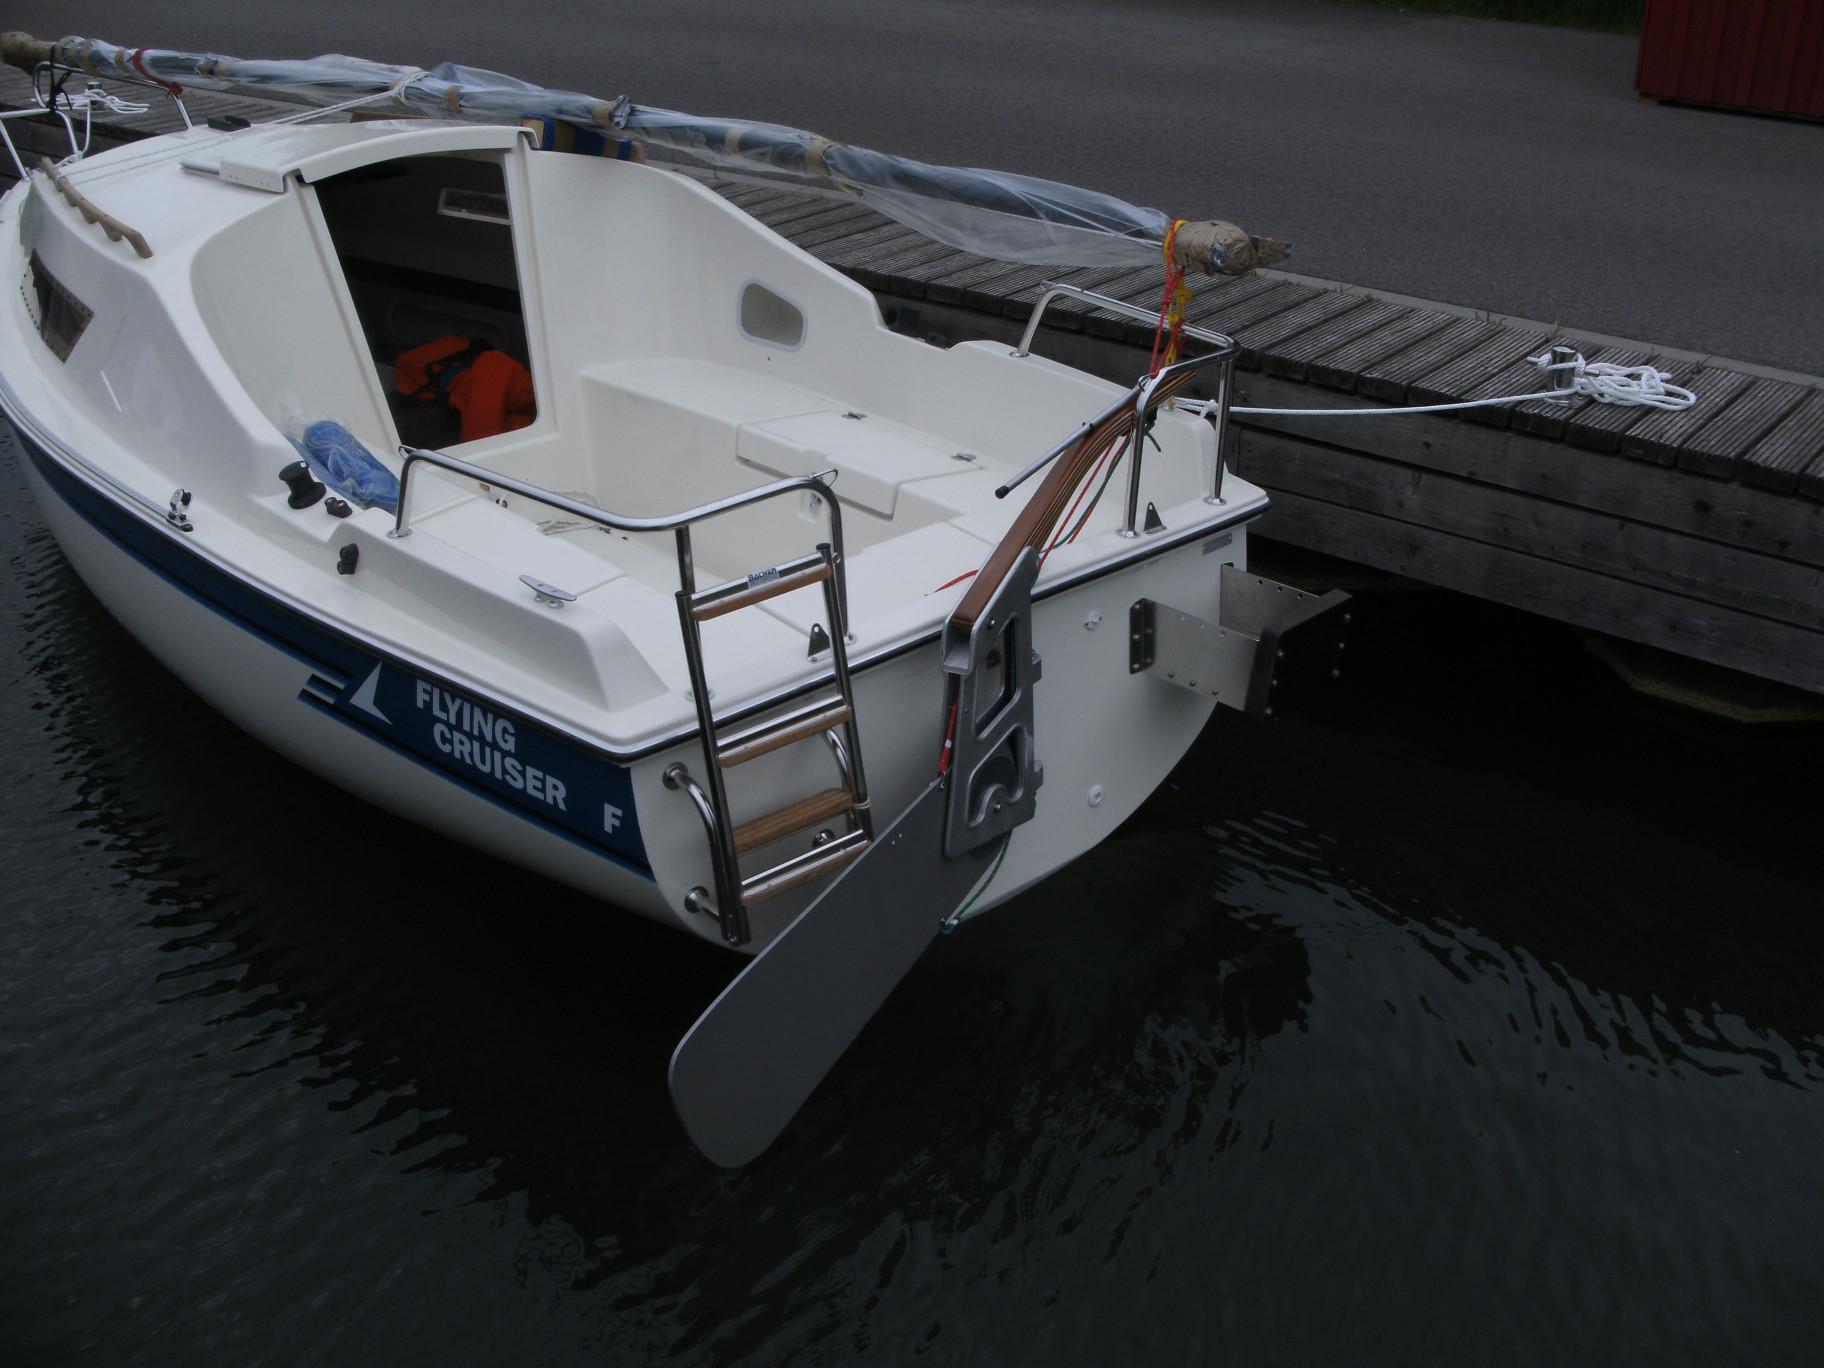 BWC Flying Cruiser F Bootsport Kajütboot